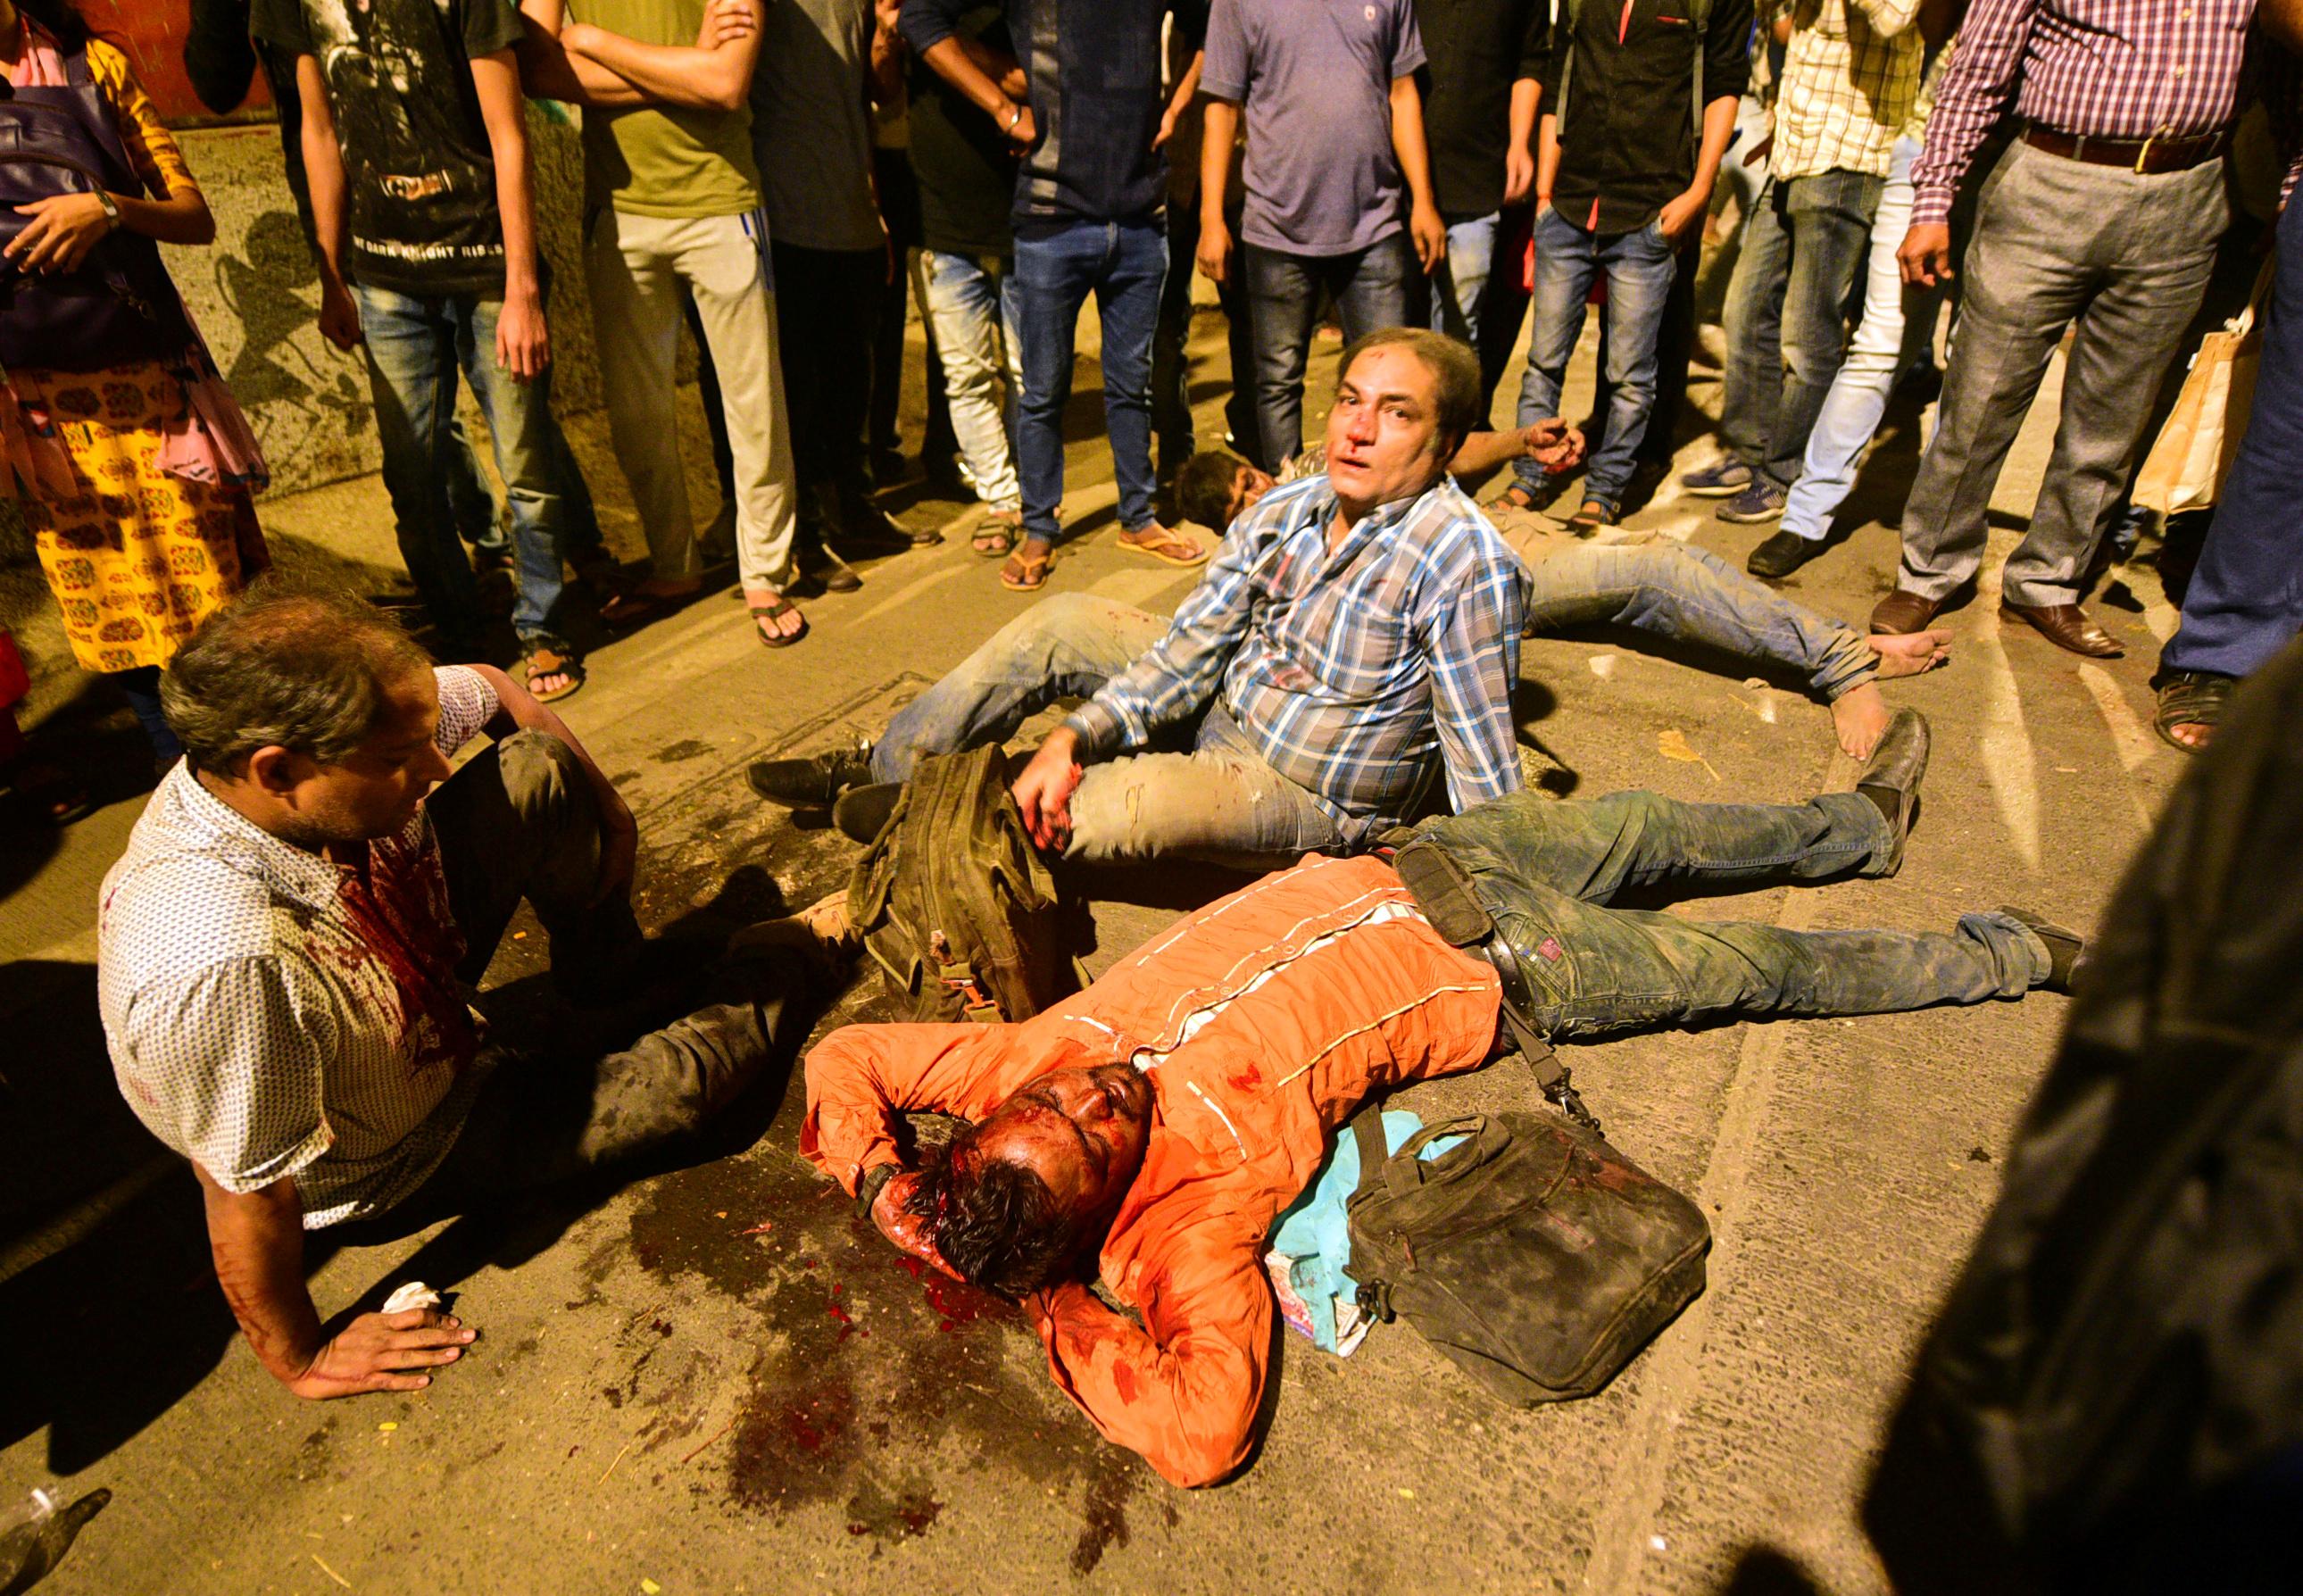 مصابون جراء انهيار جسر للمشاه فى مومباى